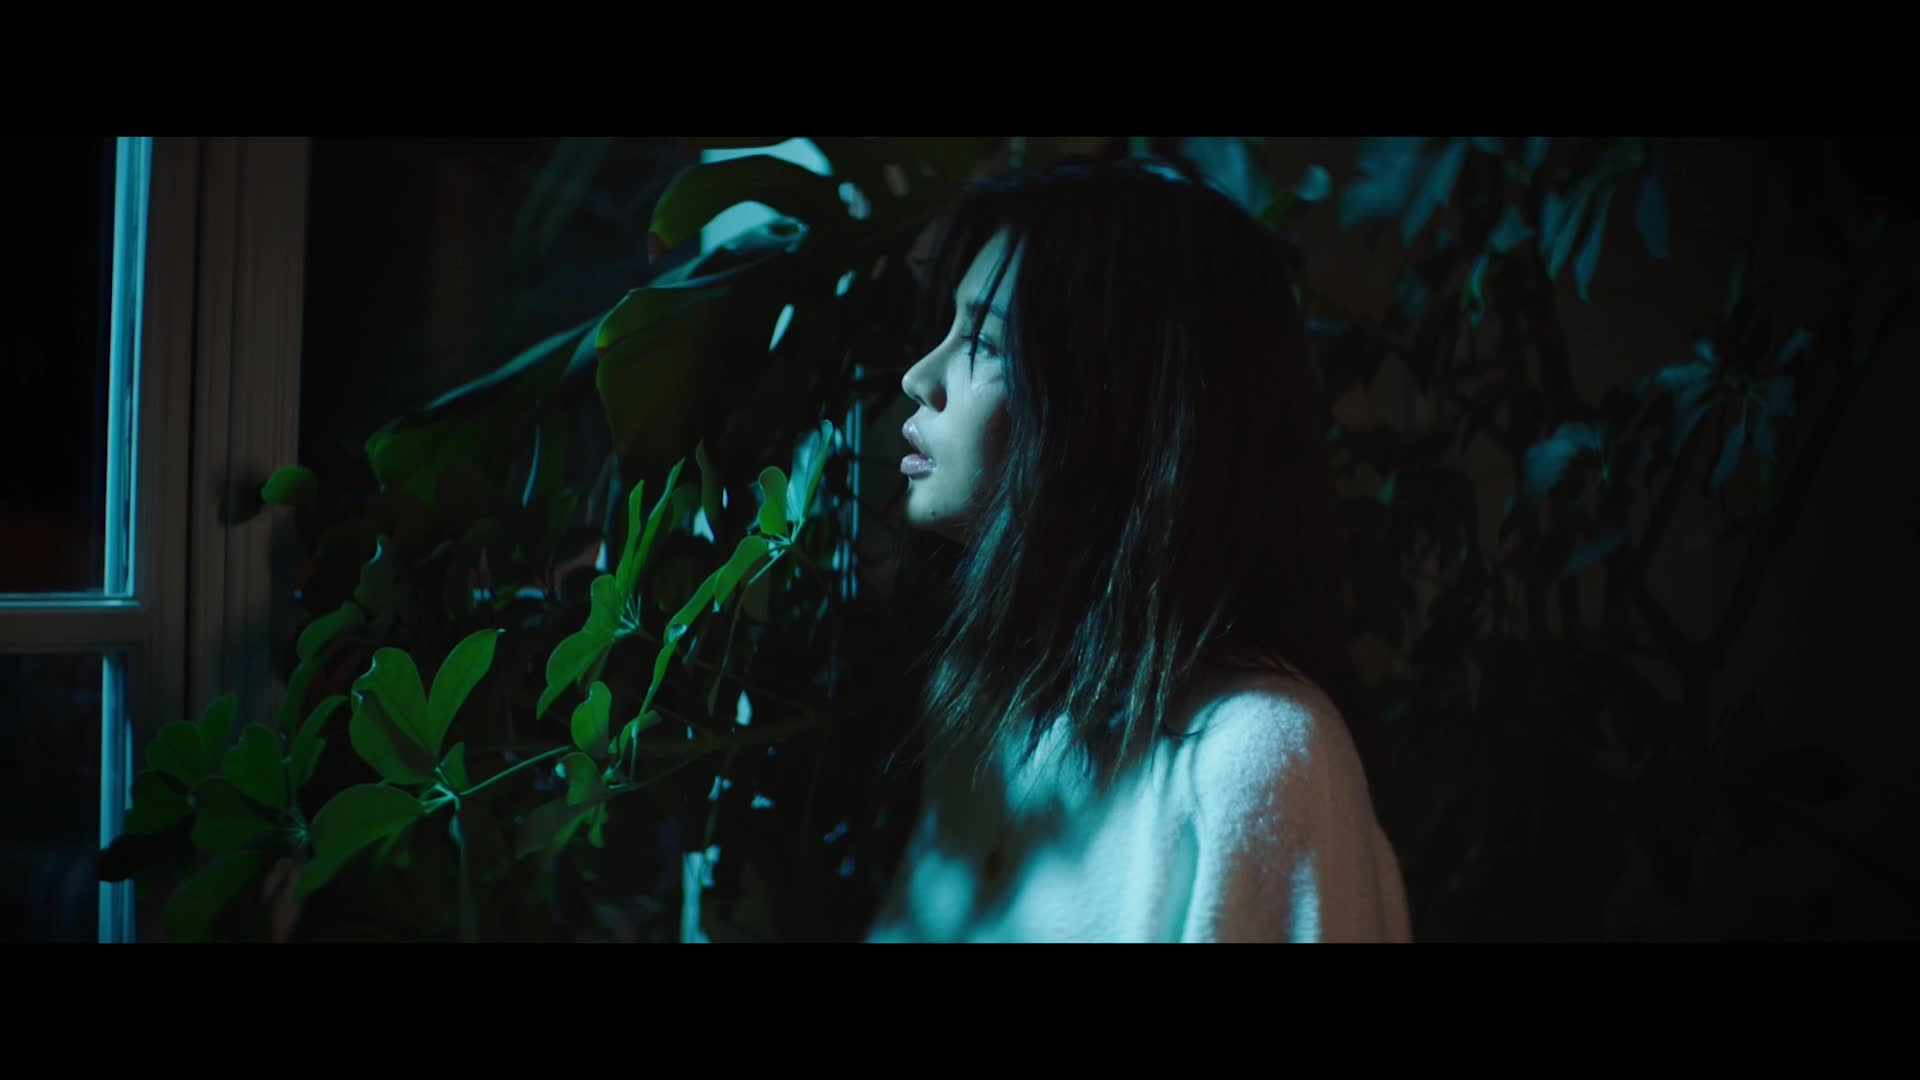 MV_프라이머리, 안다 (Primary, Anda)_월명야 (月明夜) (Feat. 신세하)